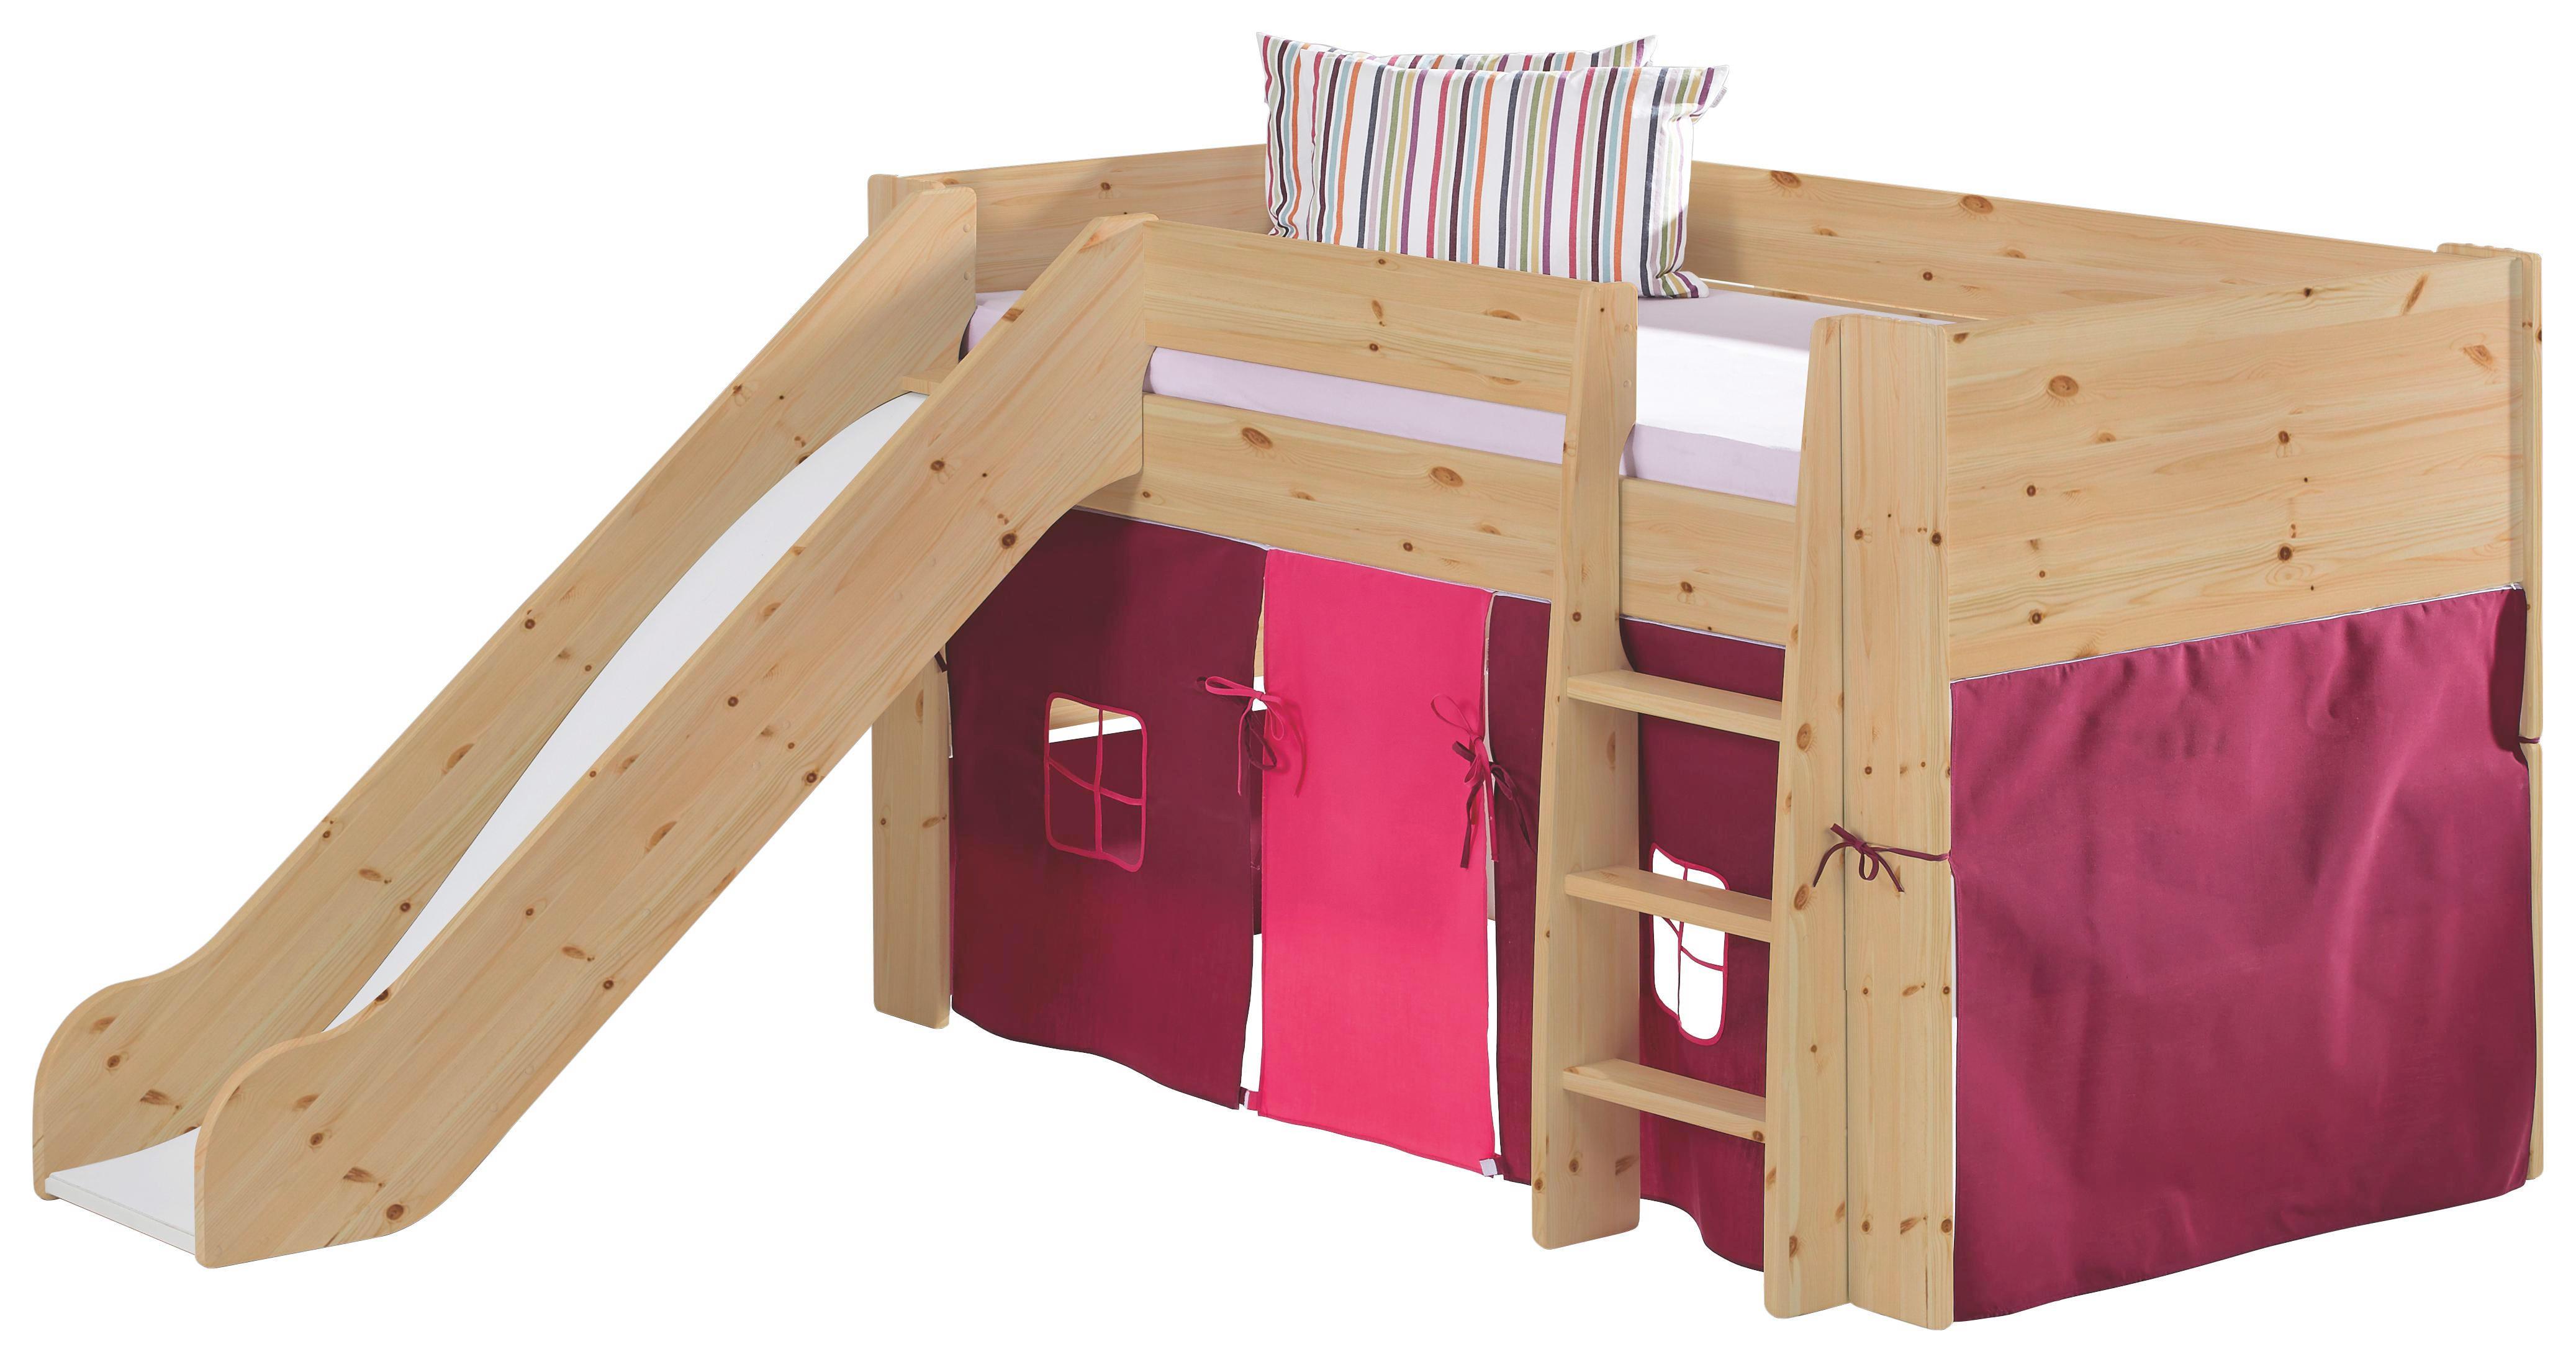 SPIELBETT Kiefer massiv Kieferfarben - Kieferfarben, Design, Holz (206/113/254cm) - CARRYHOME